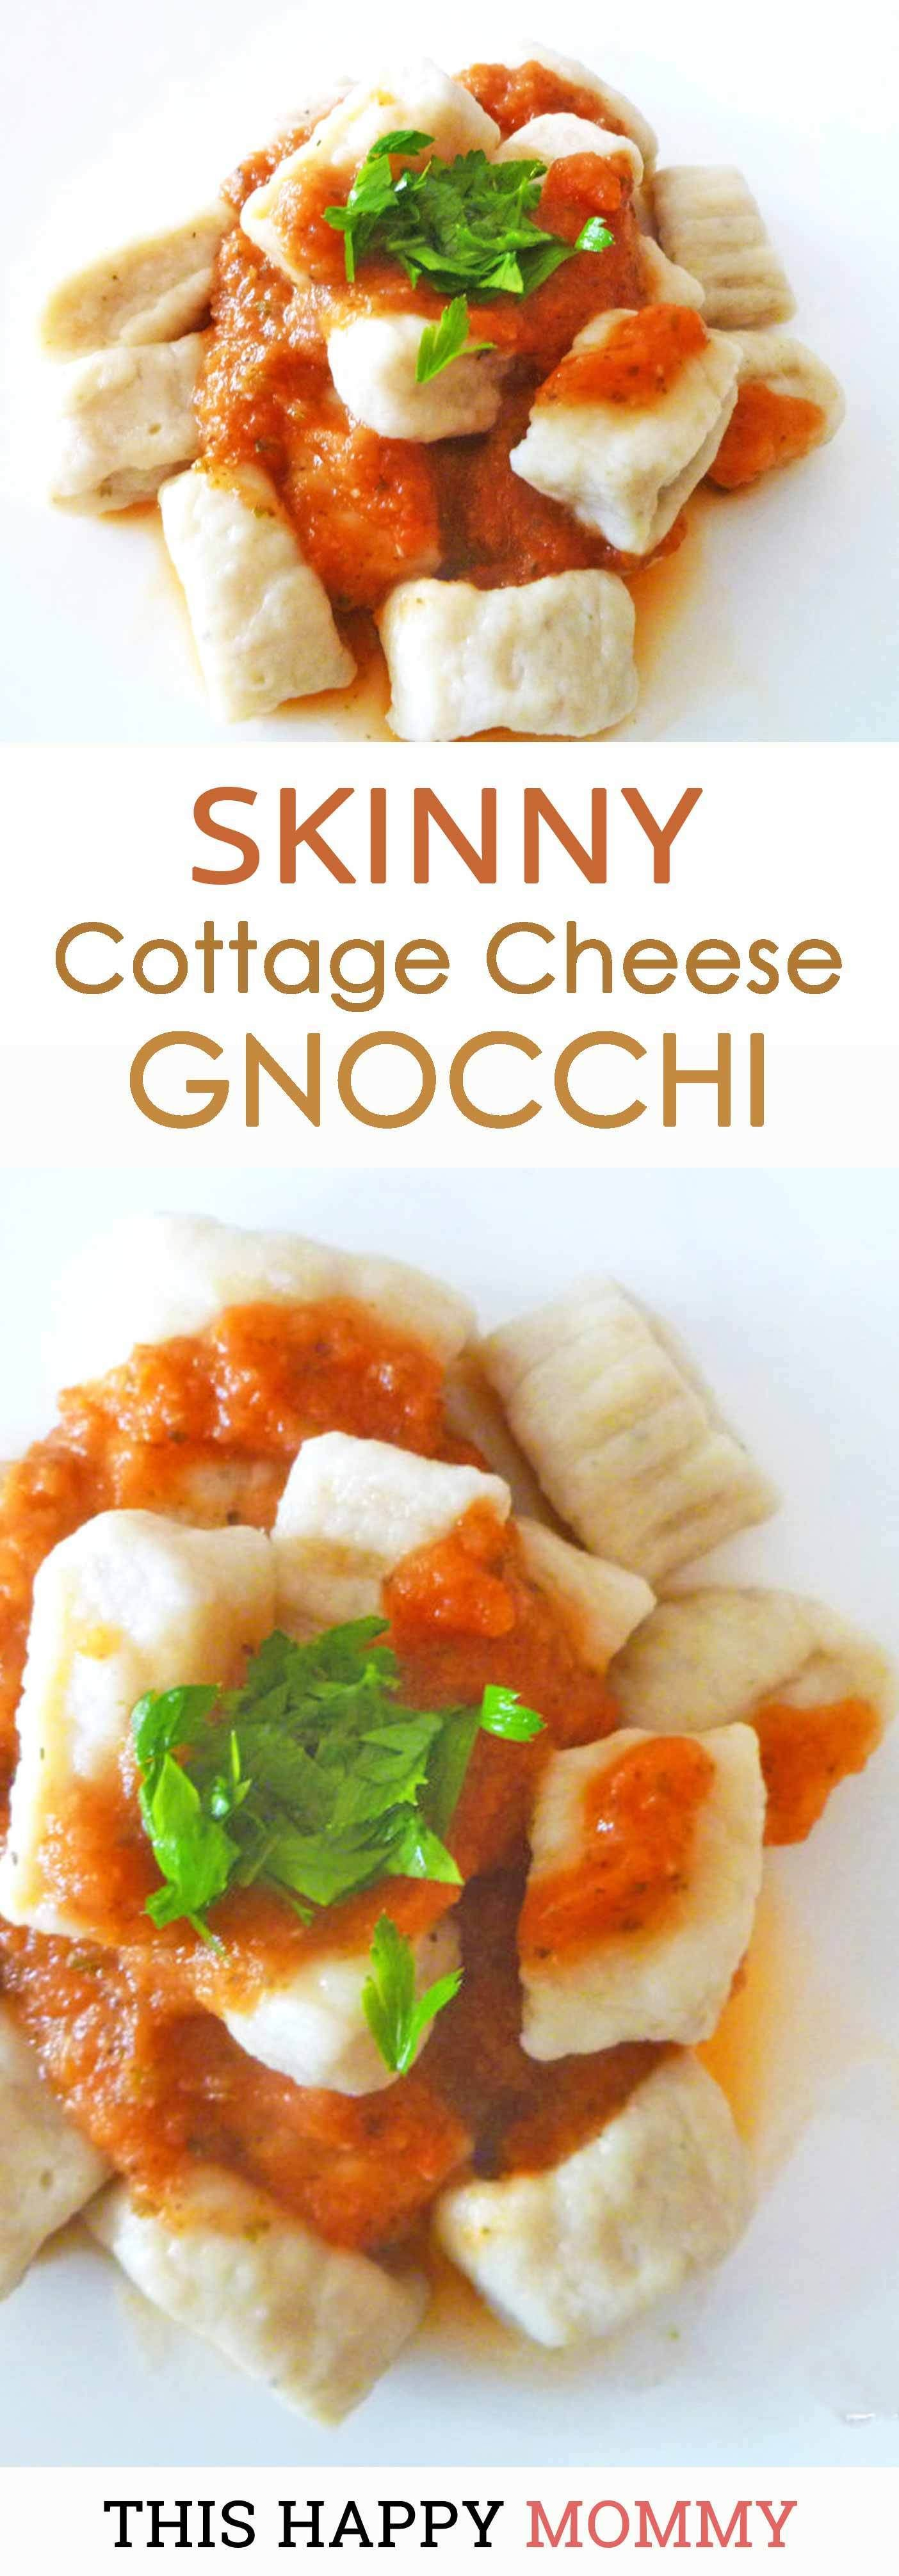 Cheese Gnocchi images